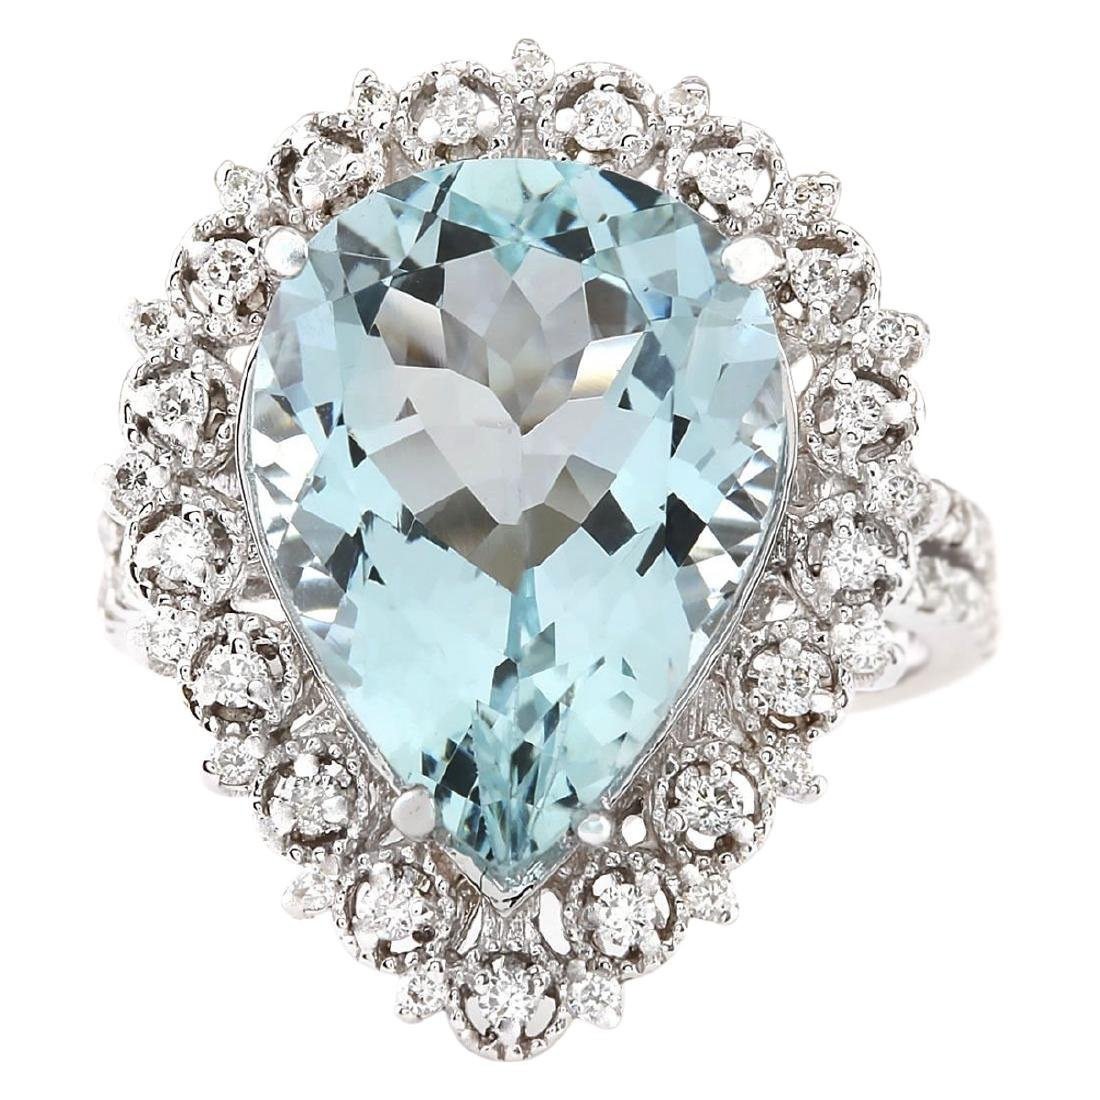 7.96 CTW Natural Aquamarine And Diamond Ring In 18K